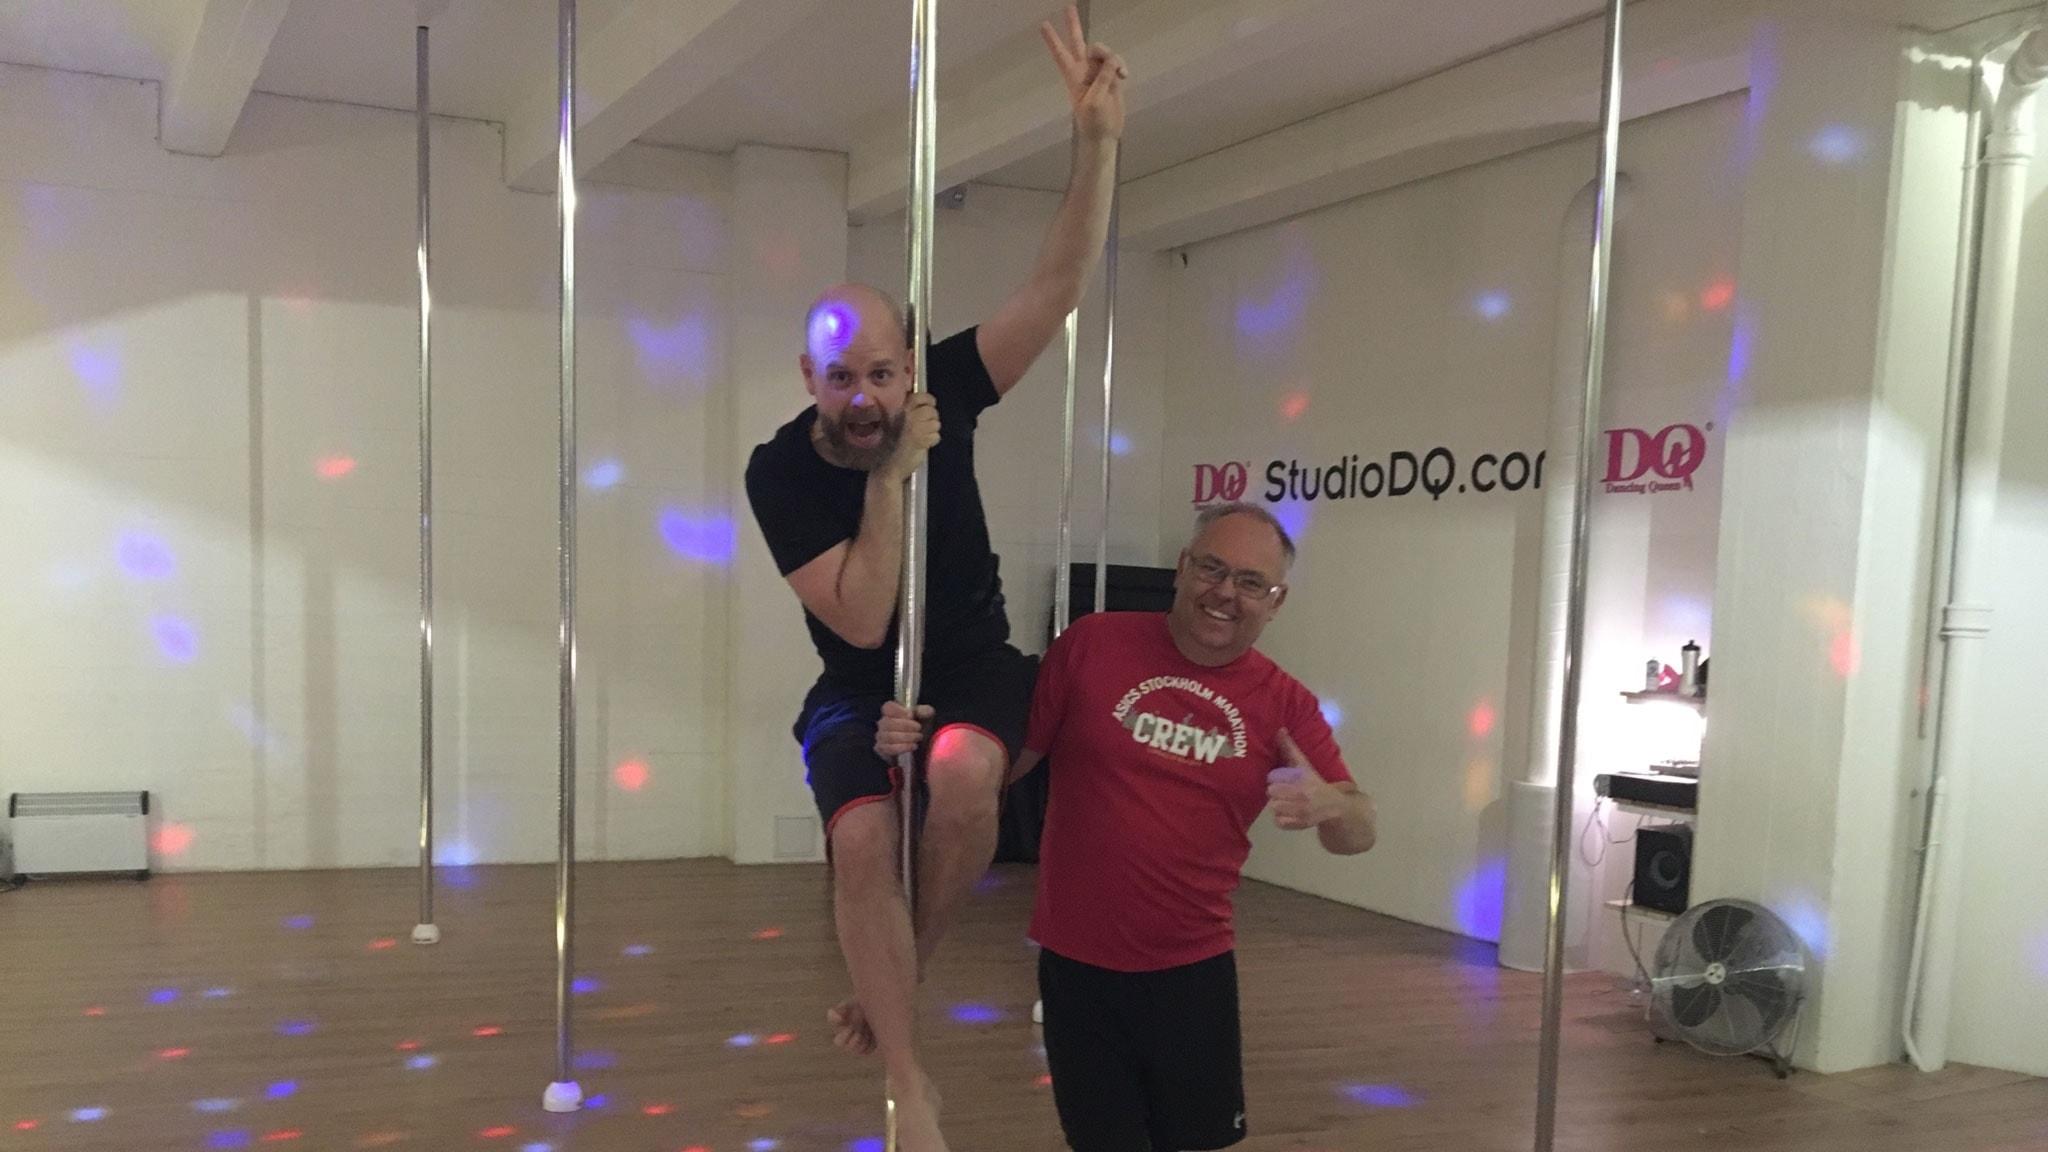 Poledance – en laddad utmaning